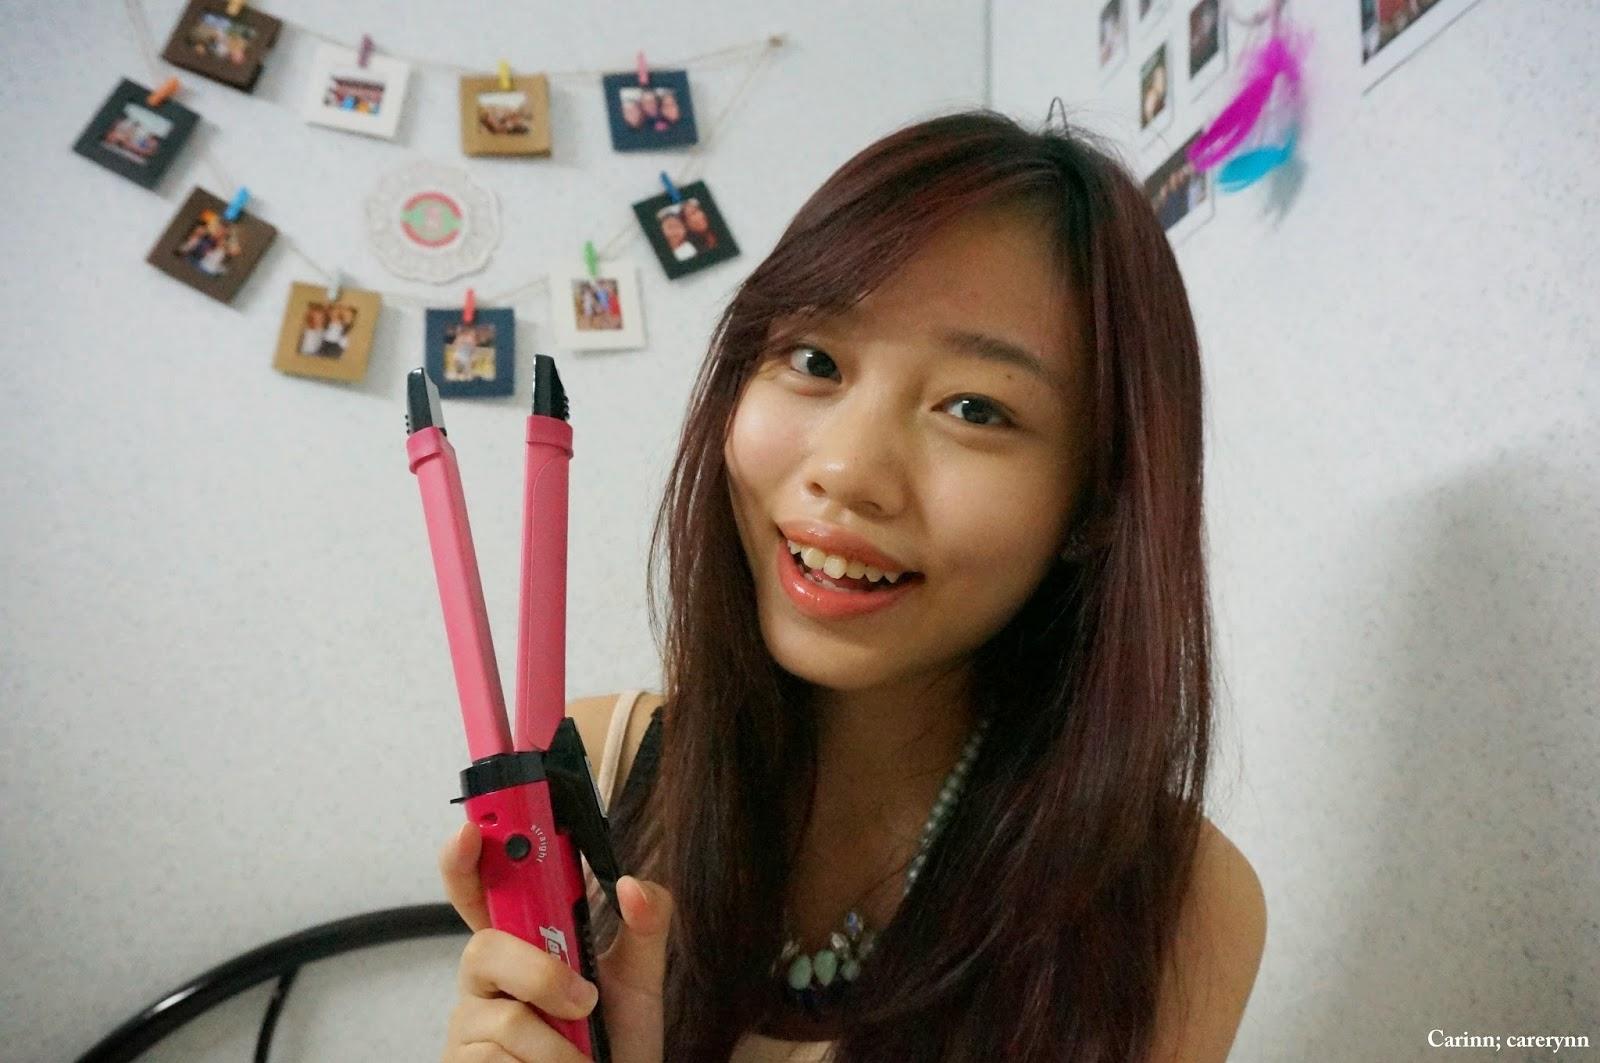 Carinn Carerynn Malaysia Fashion Beauty Lifestyle Blog Hair